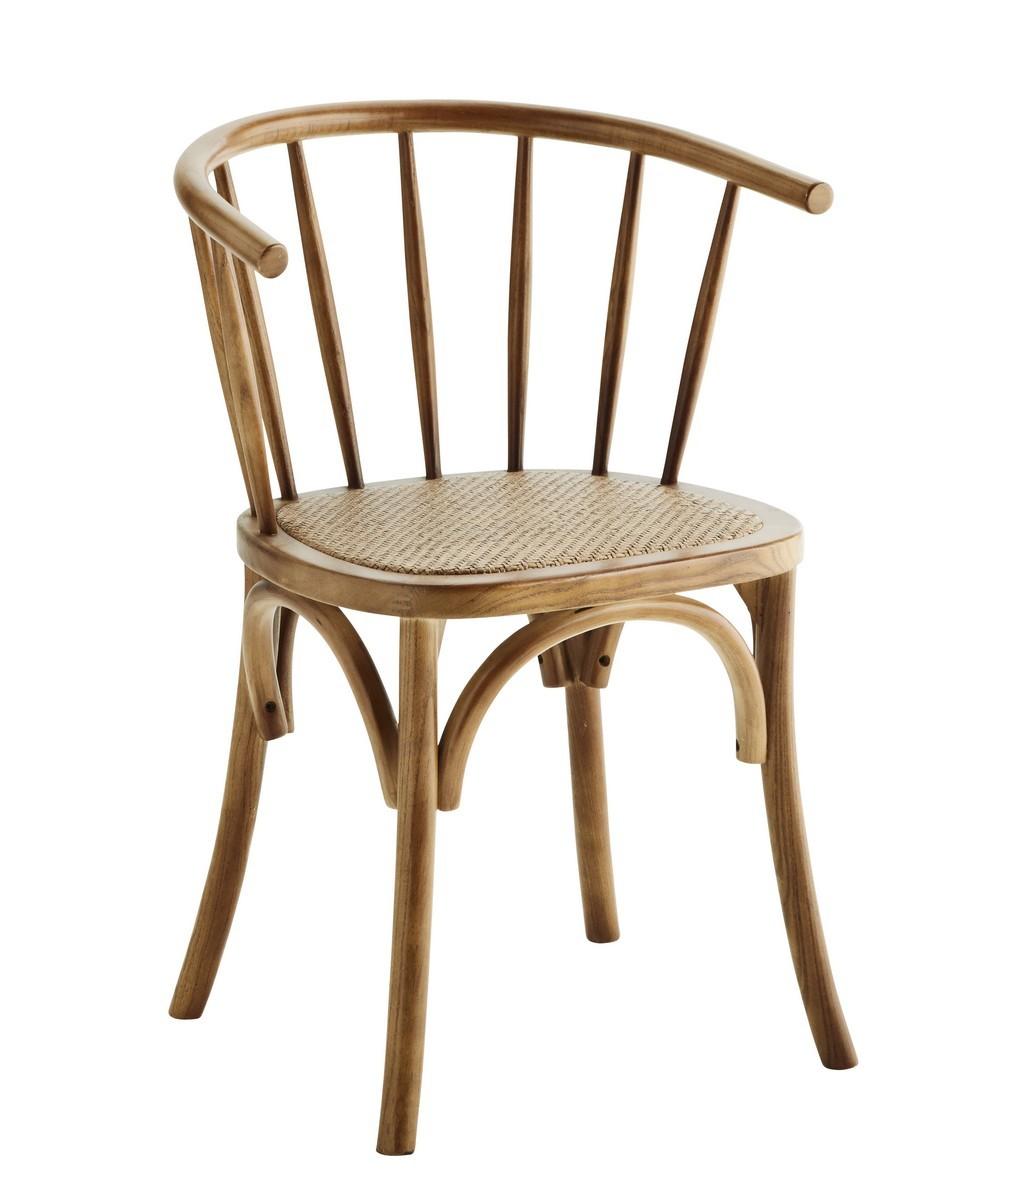 chaise retro bois naturel dossier arrondi barreaux rotin madam stoltz